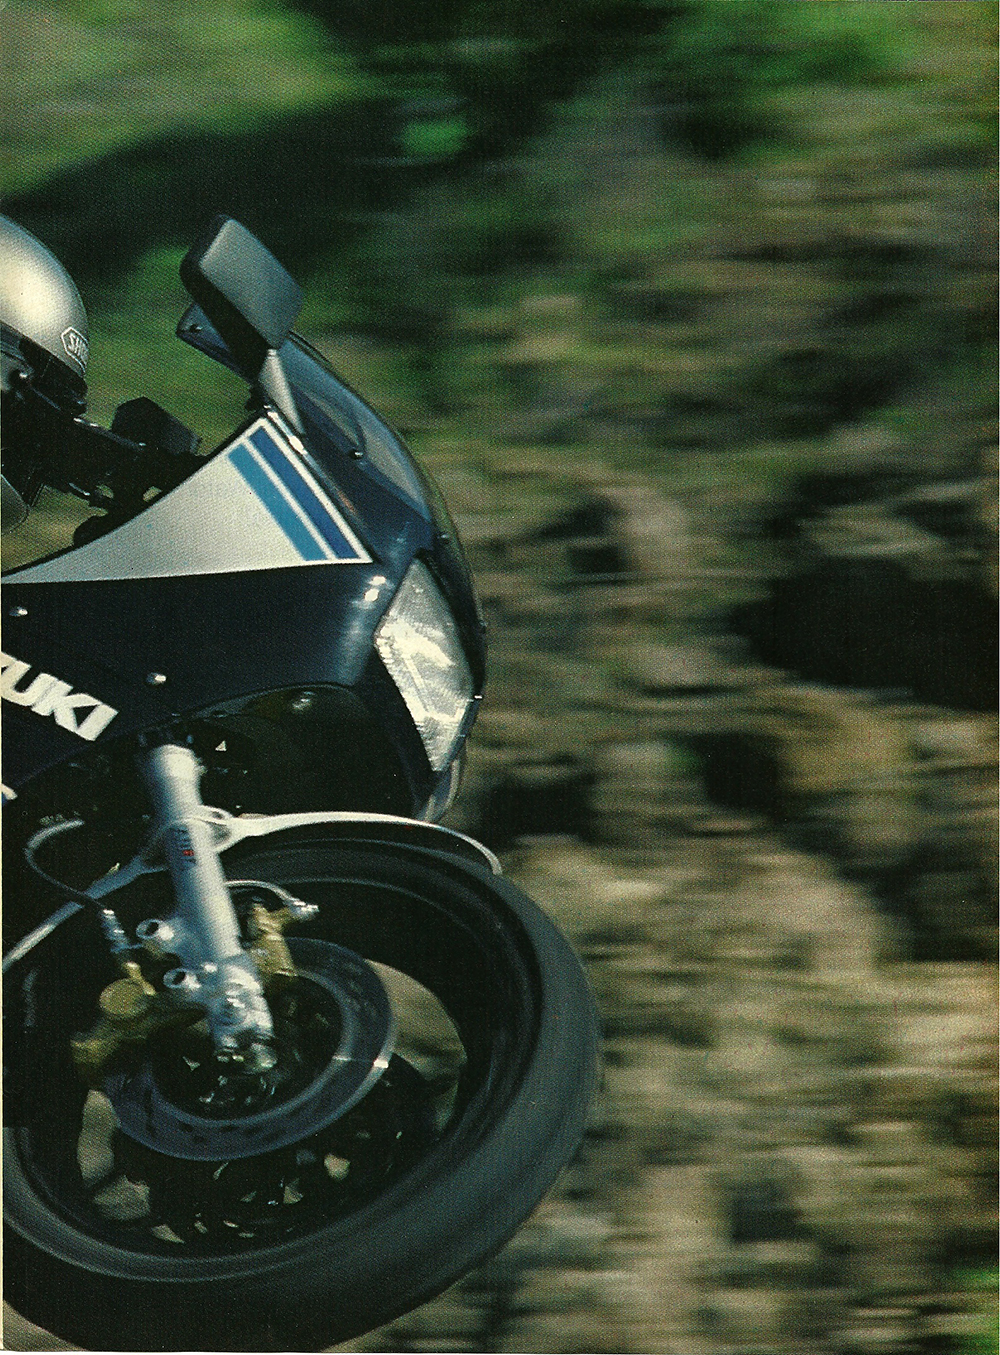 1984 Suzuki RG250 Gamma road test 2.jpg